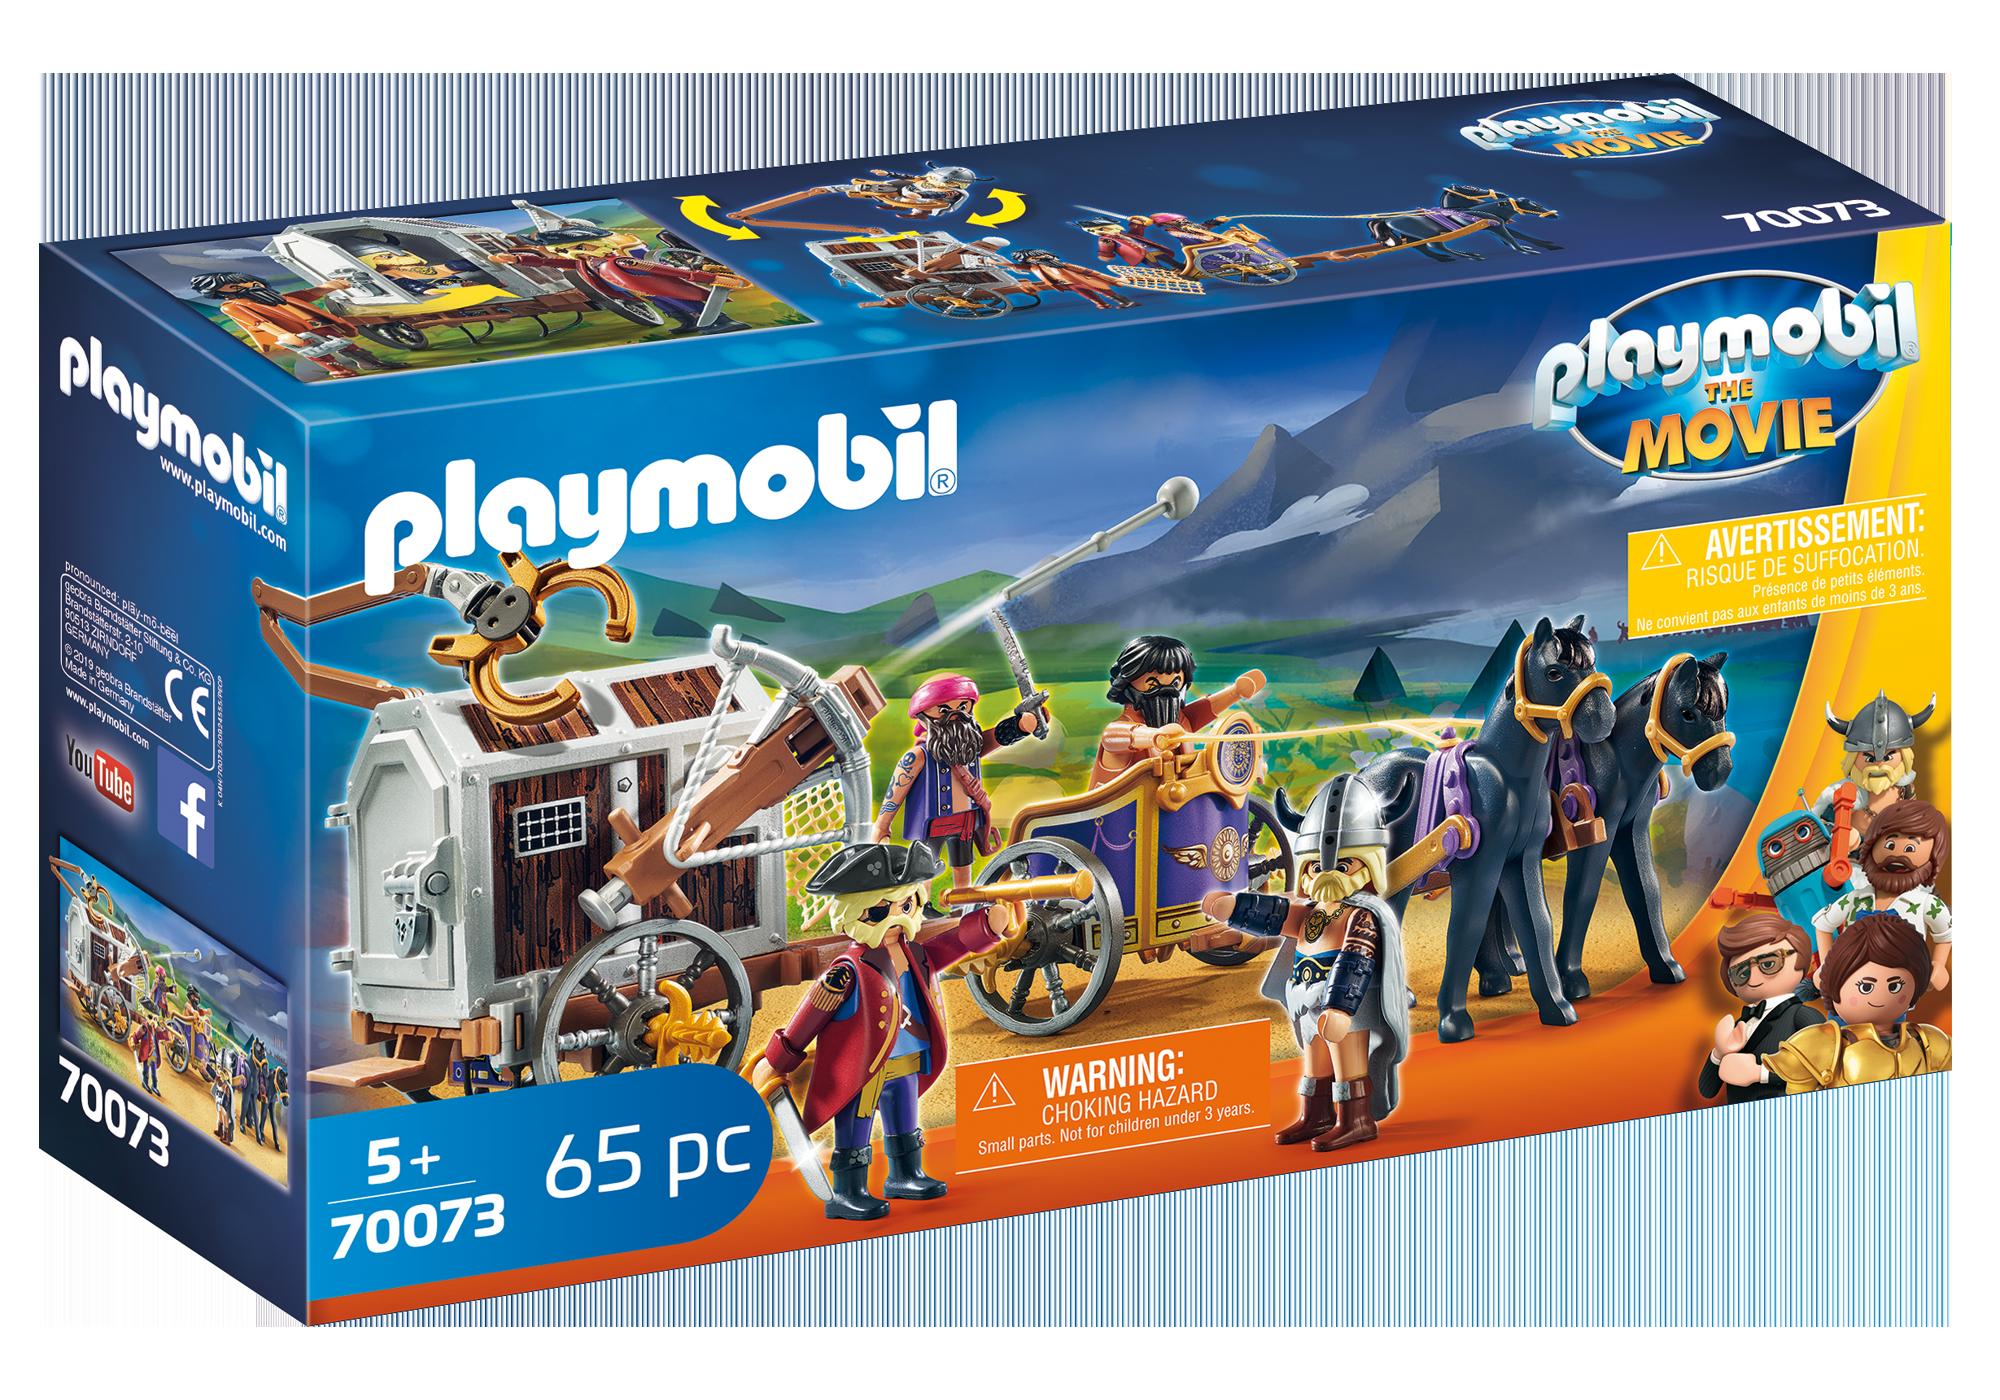 http://media.playmobil.com/i/playmobil/70073_product_box_front/PLAYMOBIL: THE MOVIE Charlie avec convoi de prison